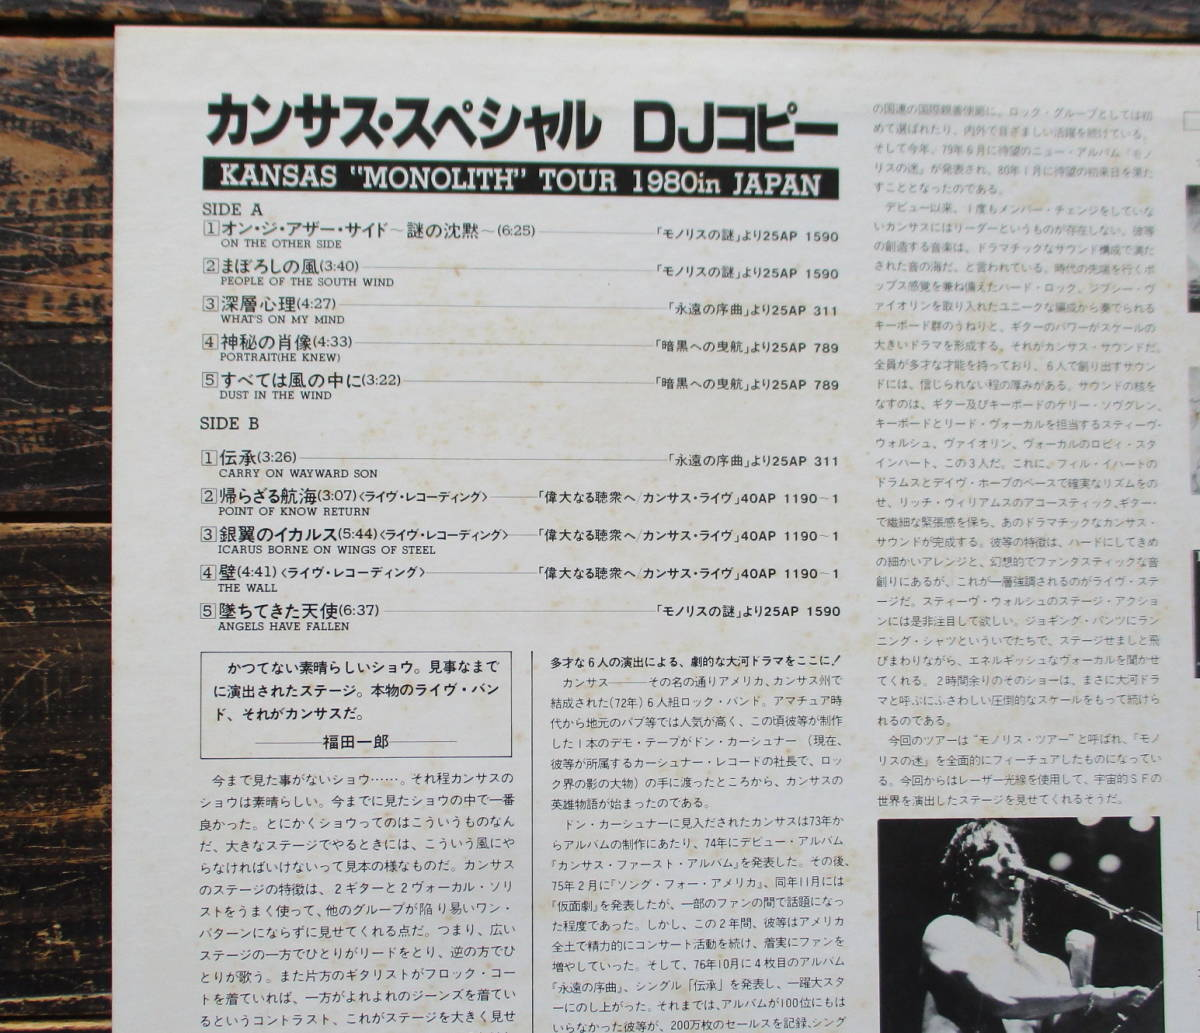 LP【KANSAS MONOLITH TOUR 1980 in JAPAN カンサス・スペシャルDJコピー】_画像3